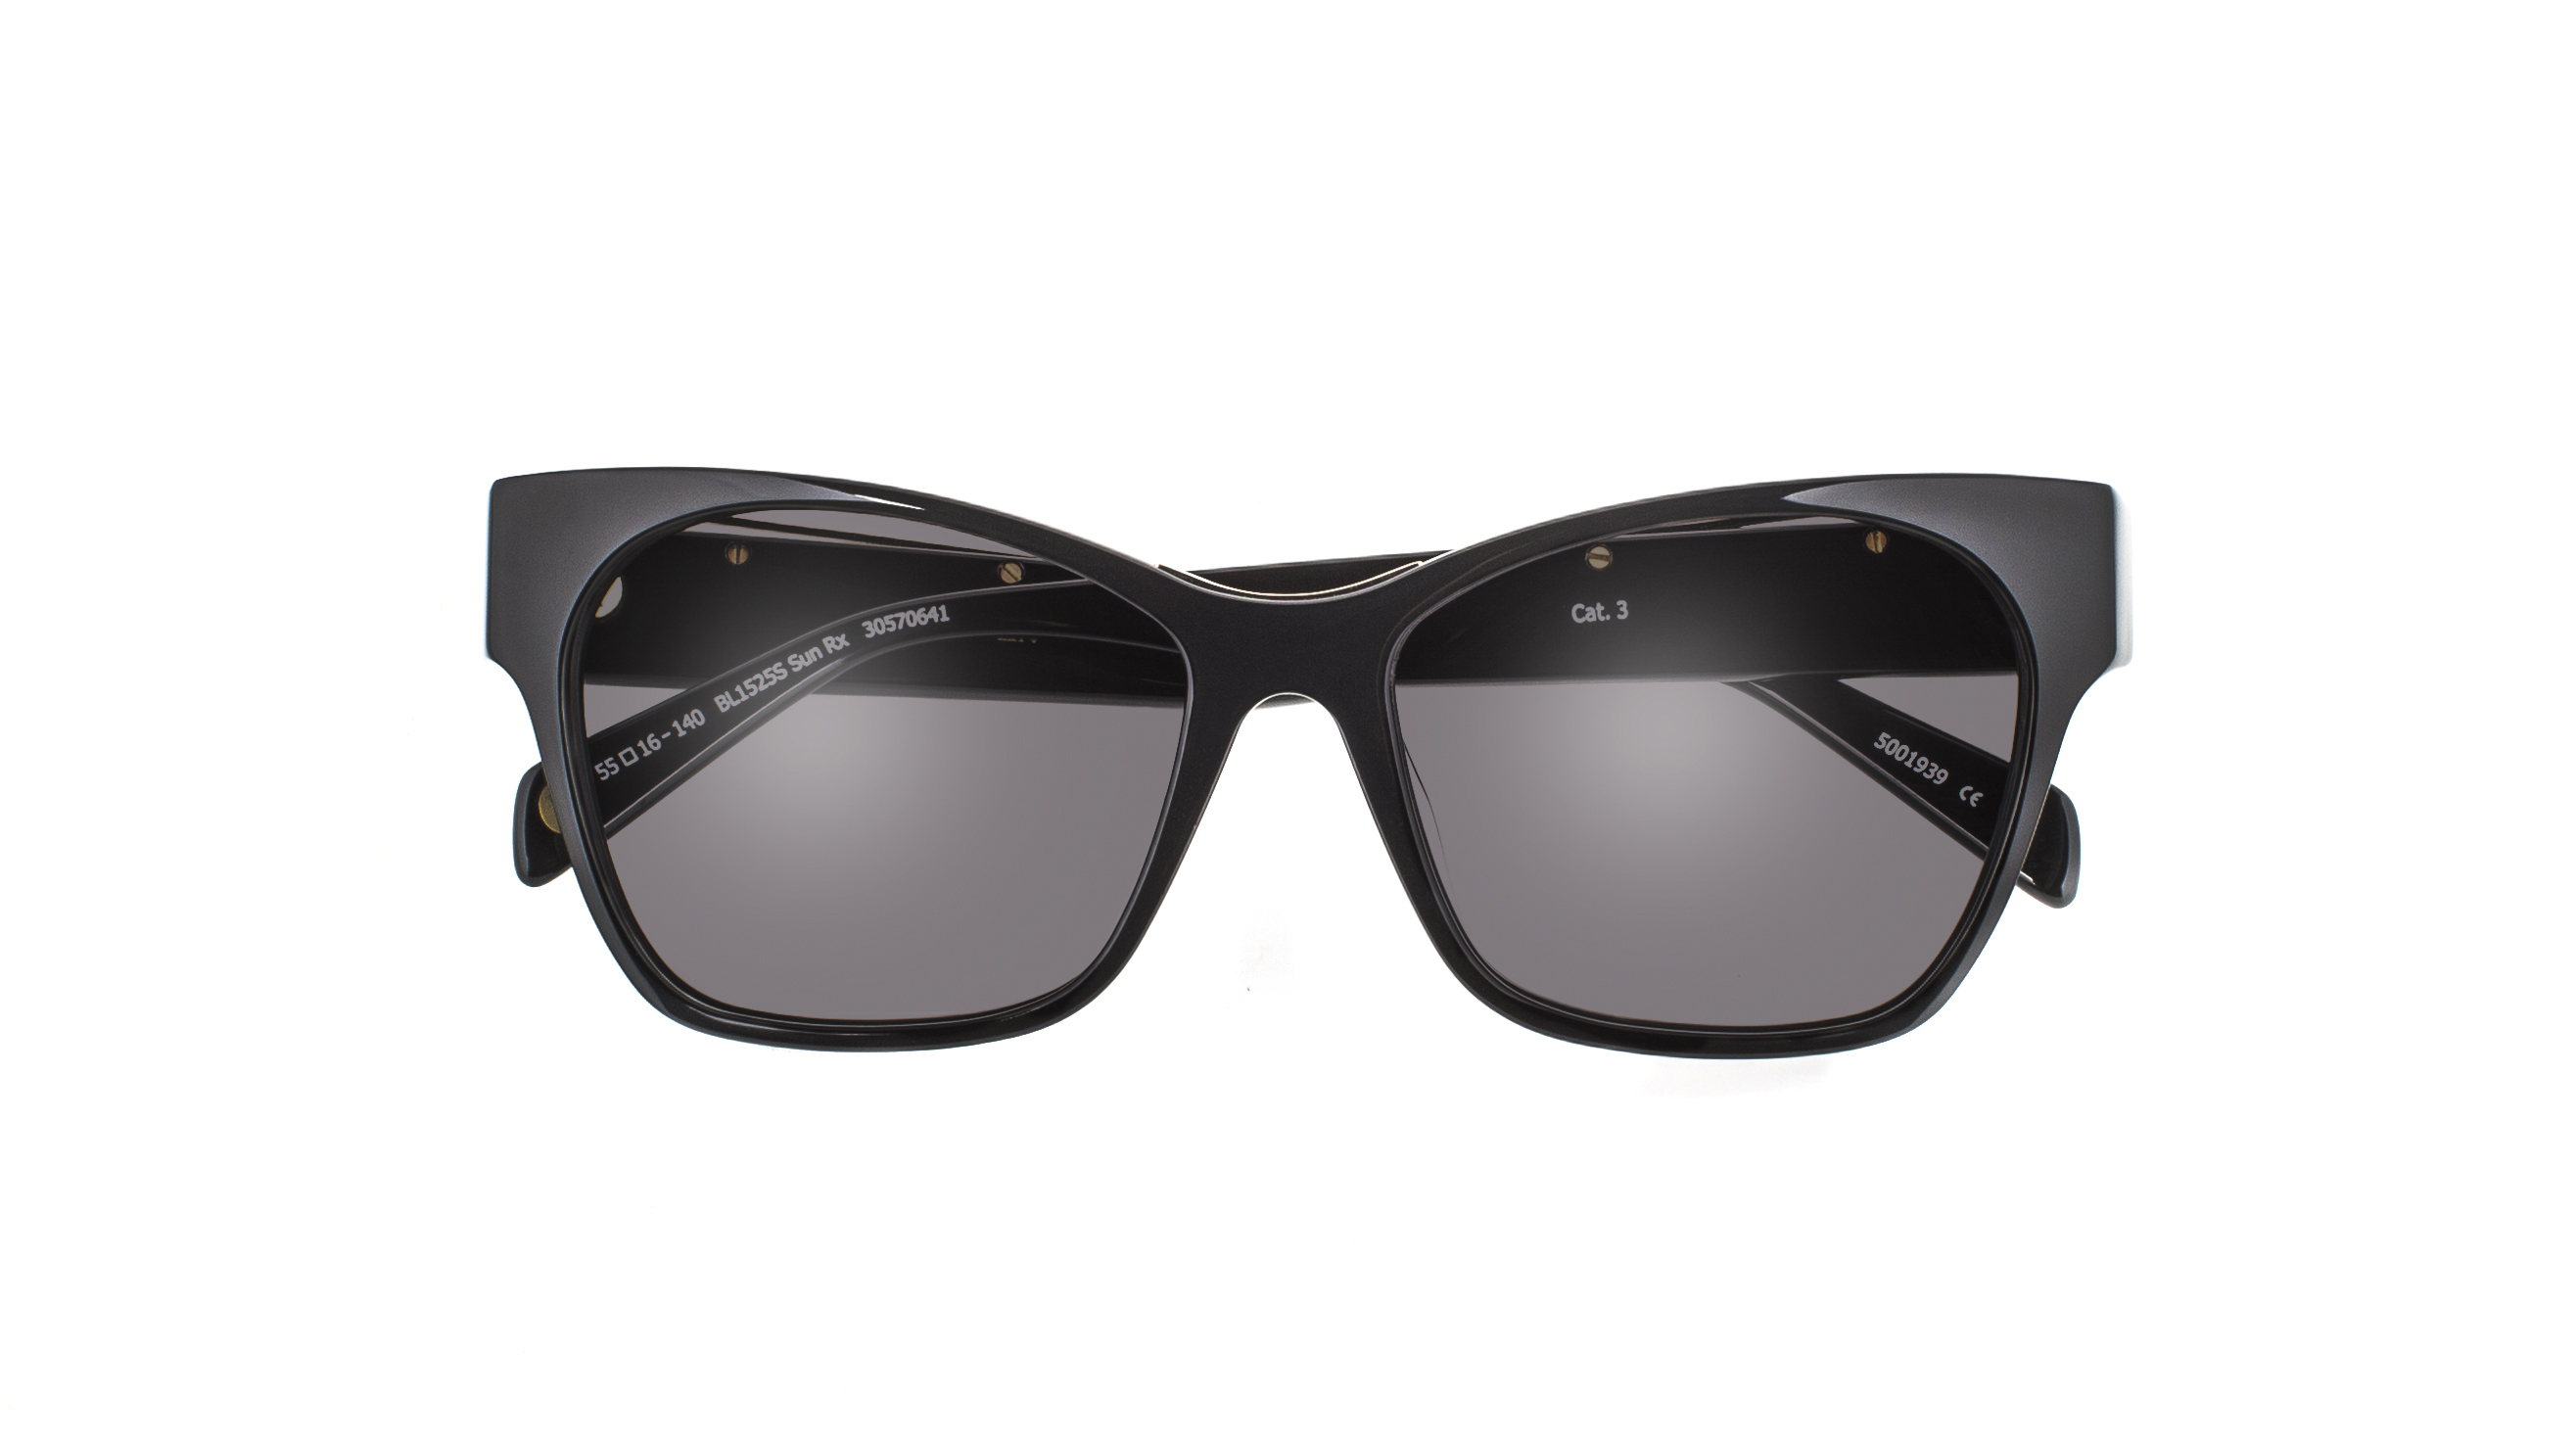 Balmain x Specsavers BL1528S SUN RX 30570634 - RRP 2 pairs single vision $459